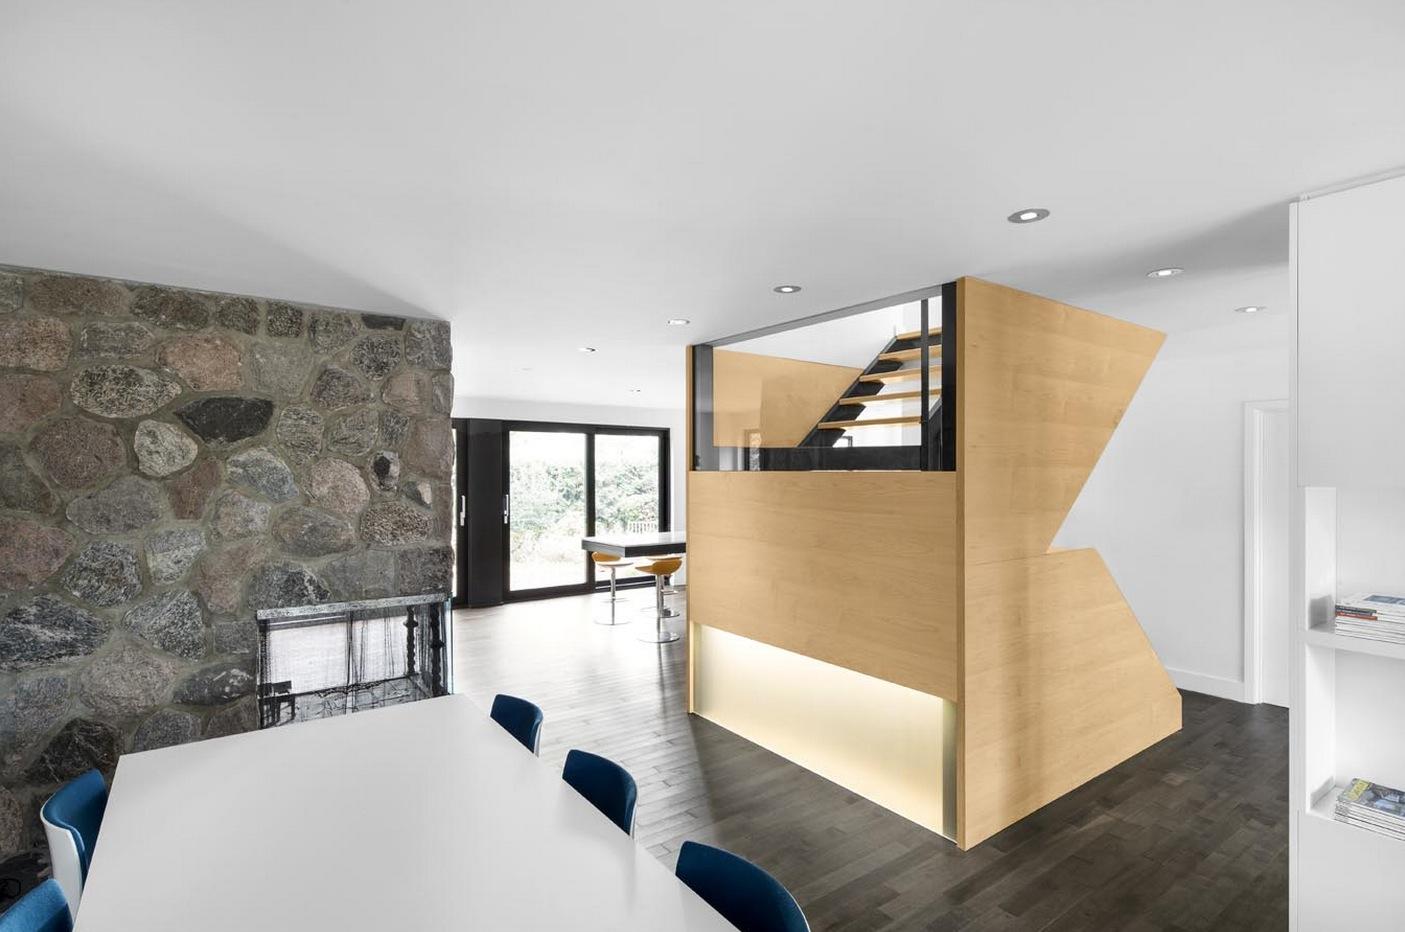 Residence-Closse-naturehumaine-design-11